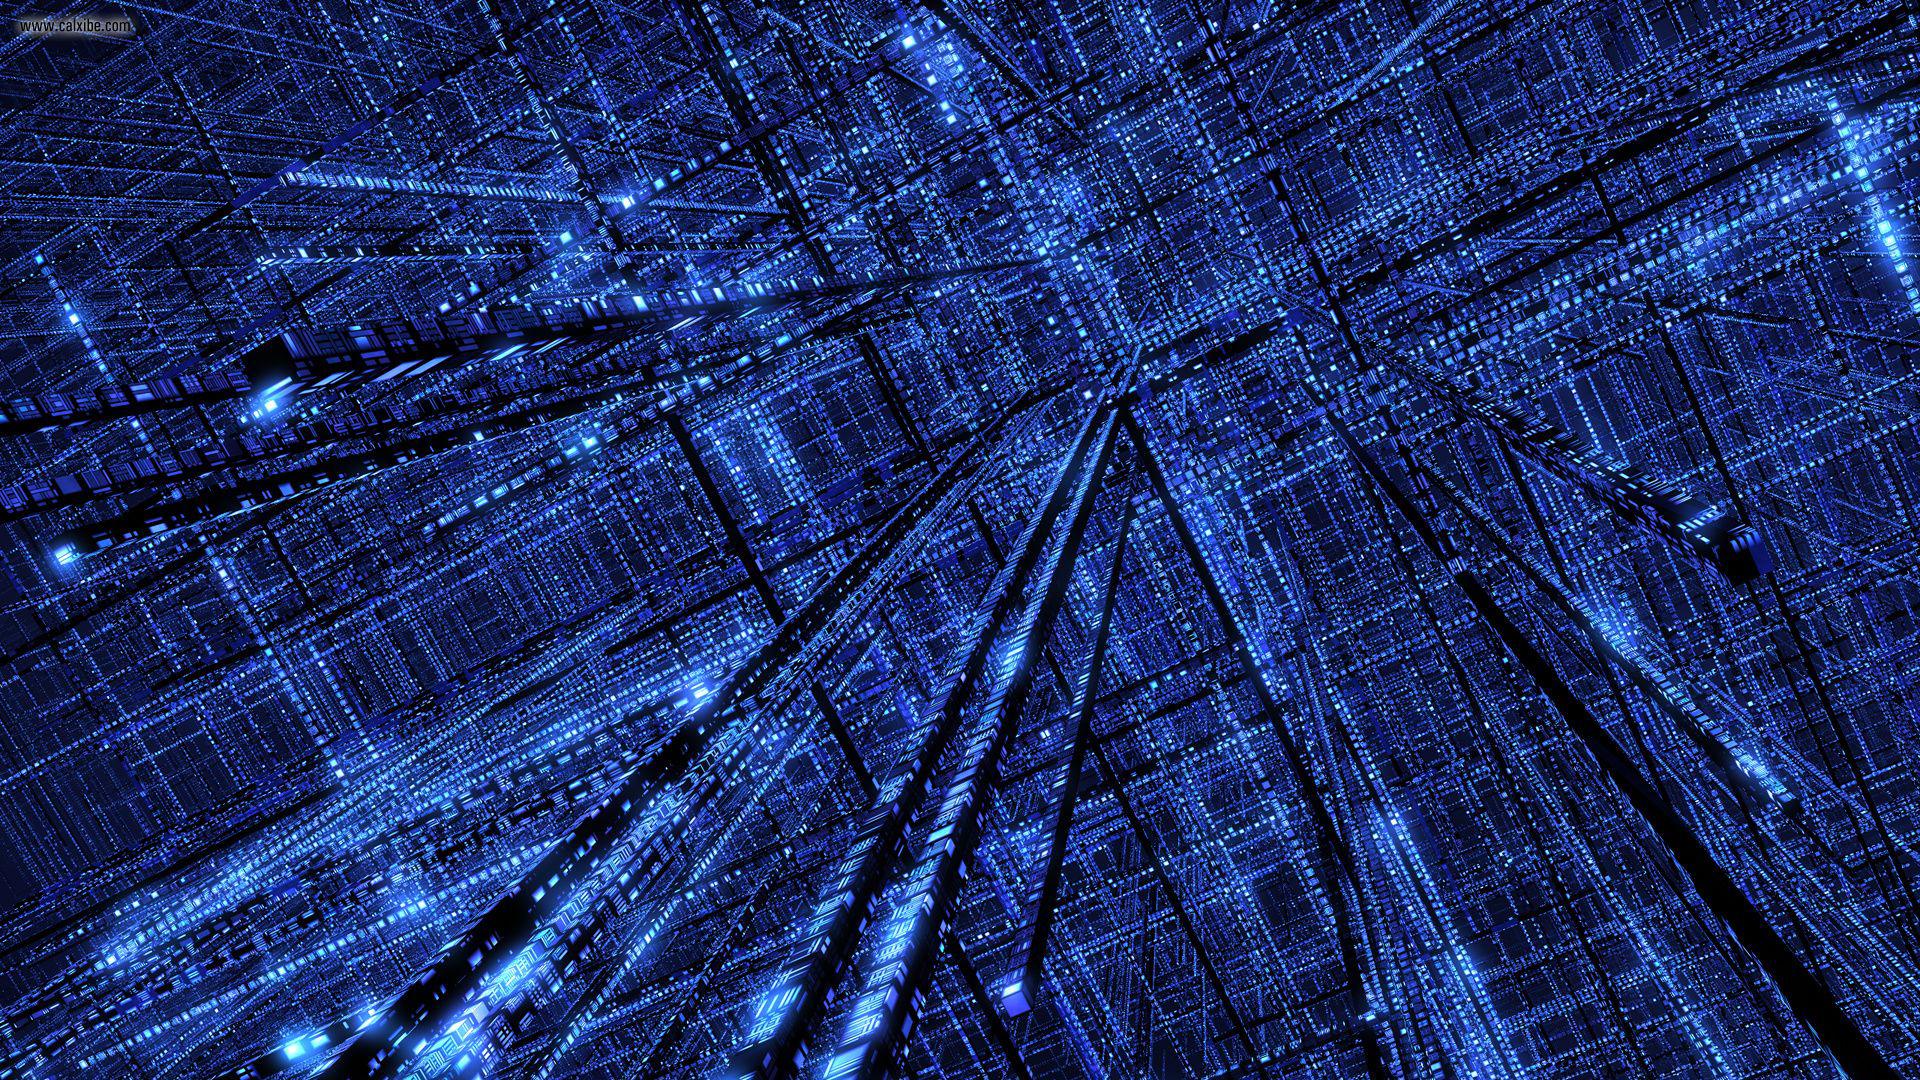 Matrix Animated Wallpaper Windows 10 Matrix Wallpaper For Windows 10